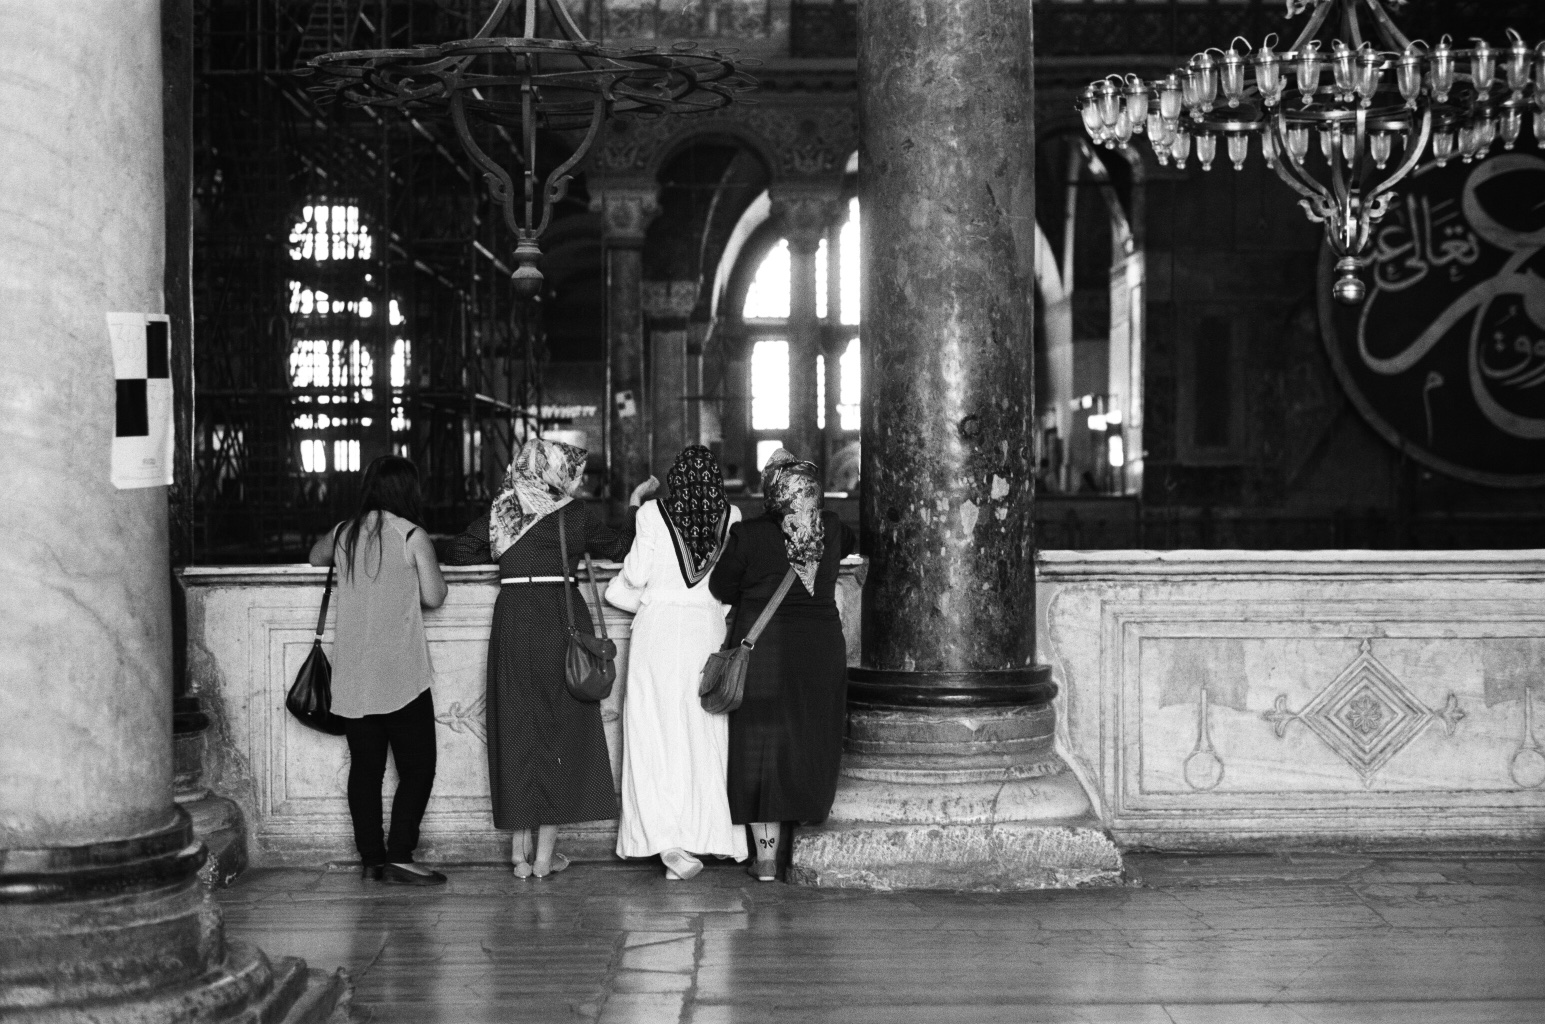 056_IstanbulCathedral.jpg